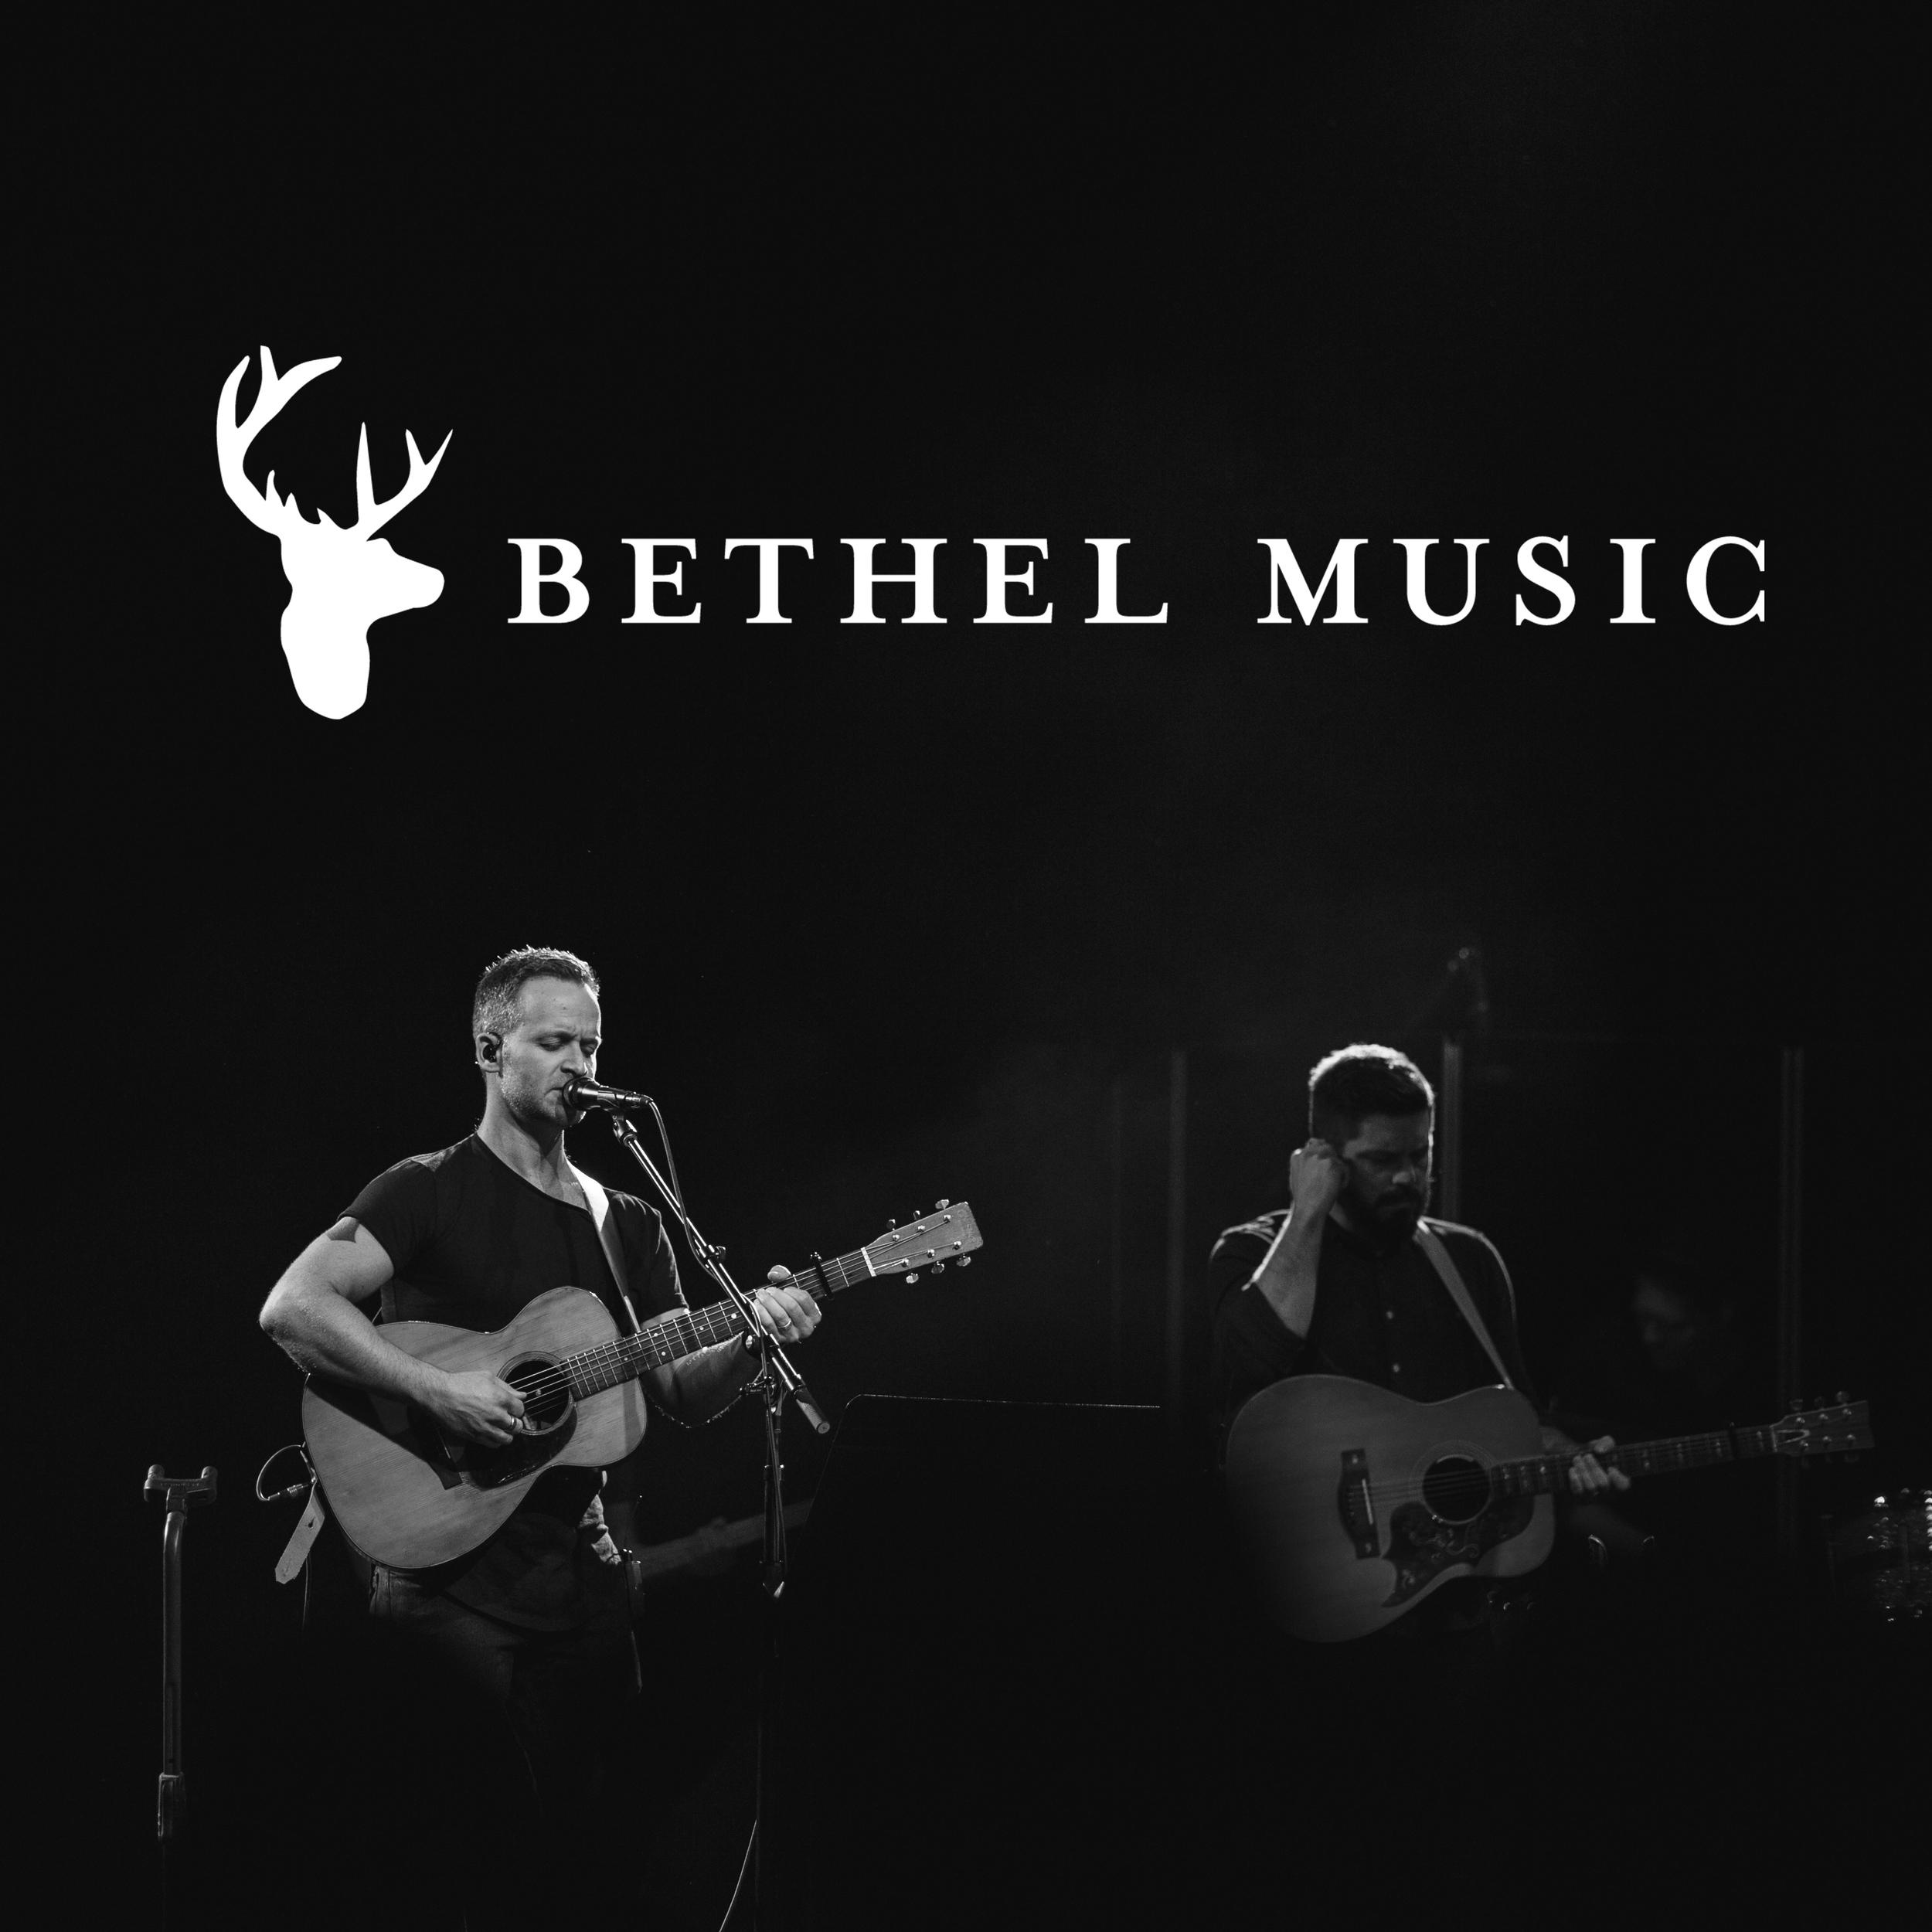 Bethel-Music.jpg